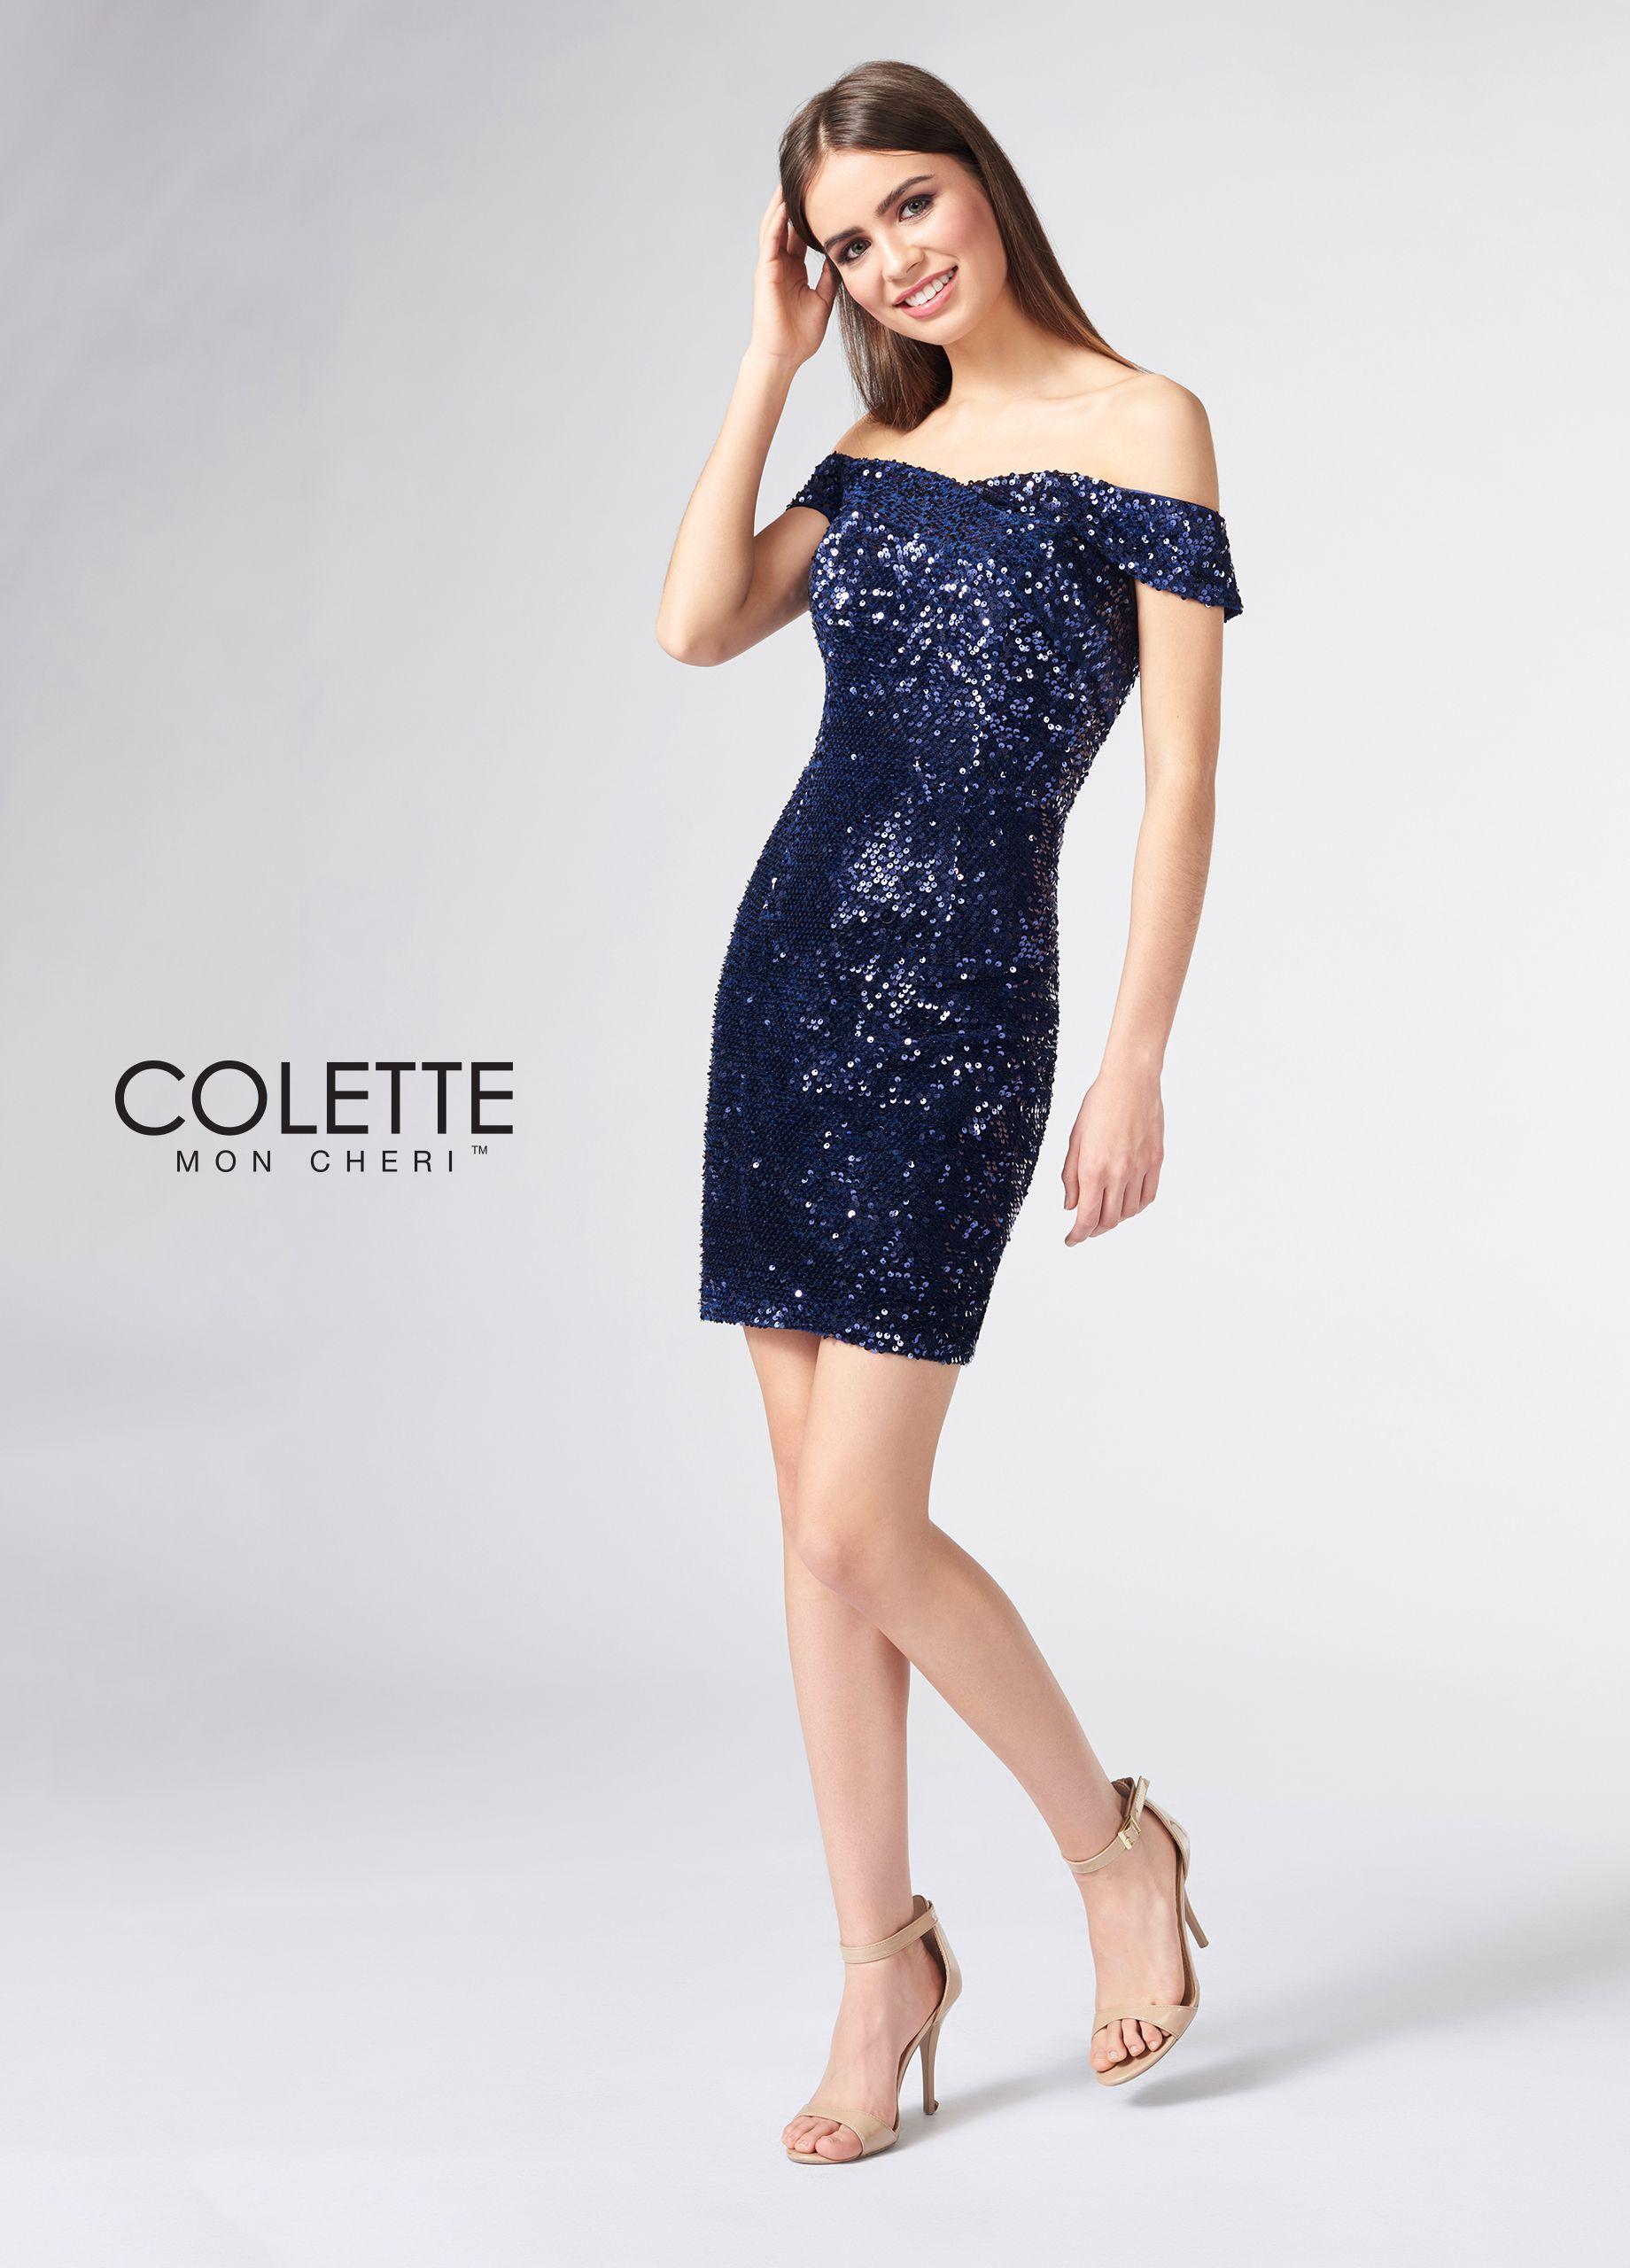 3bcb1e856aa Wonderful Party Dresses by Colette Mon Cheri 2019 – My Stylish Zoo   WomenDress  weddingdress  eveningdress  cocktaildress  bridesmaiddress   promdress ...